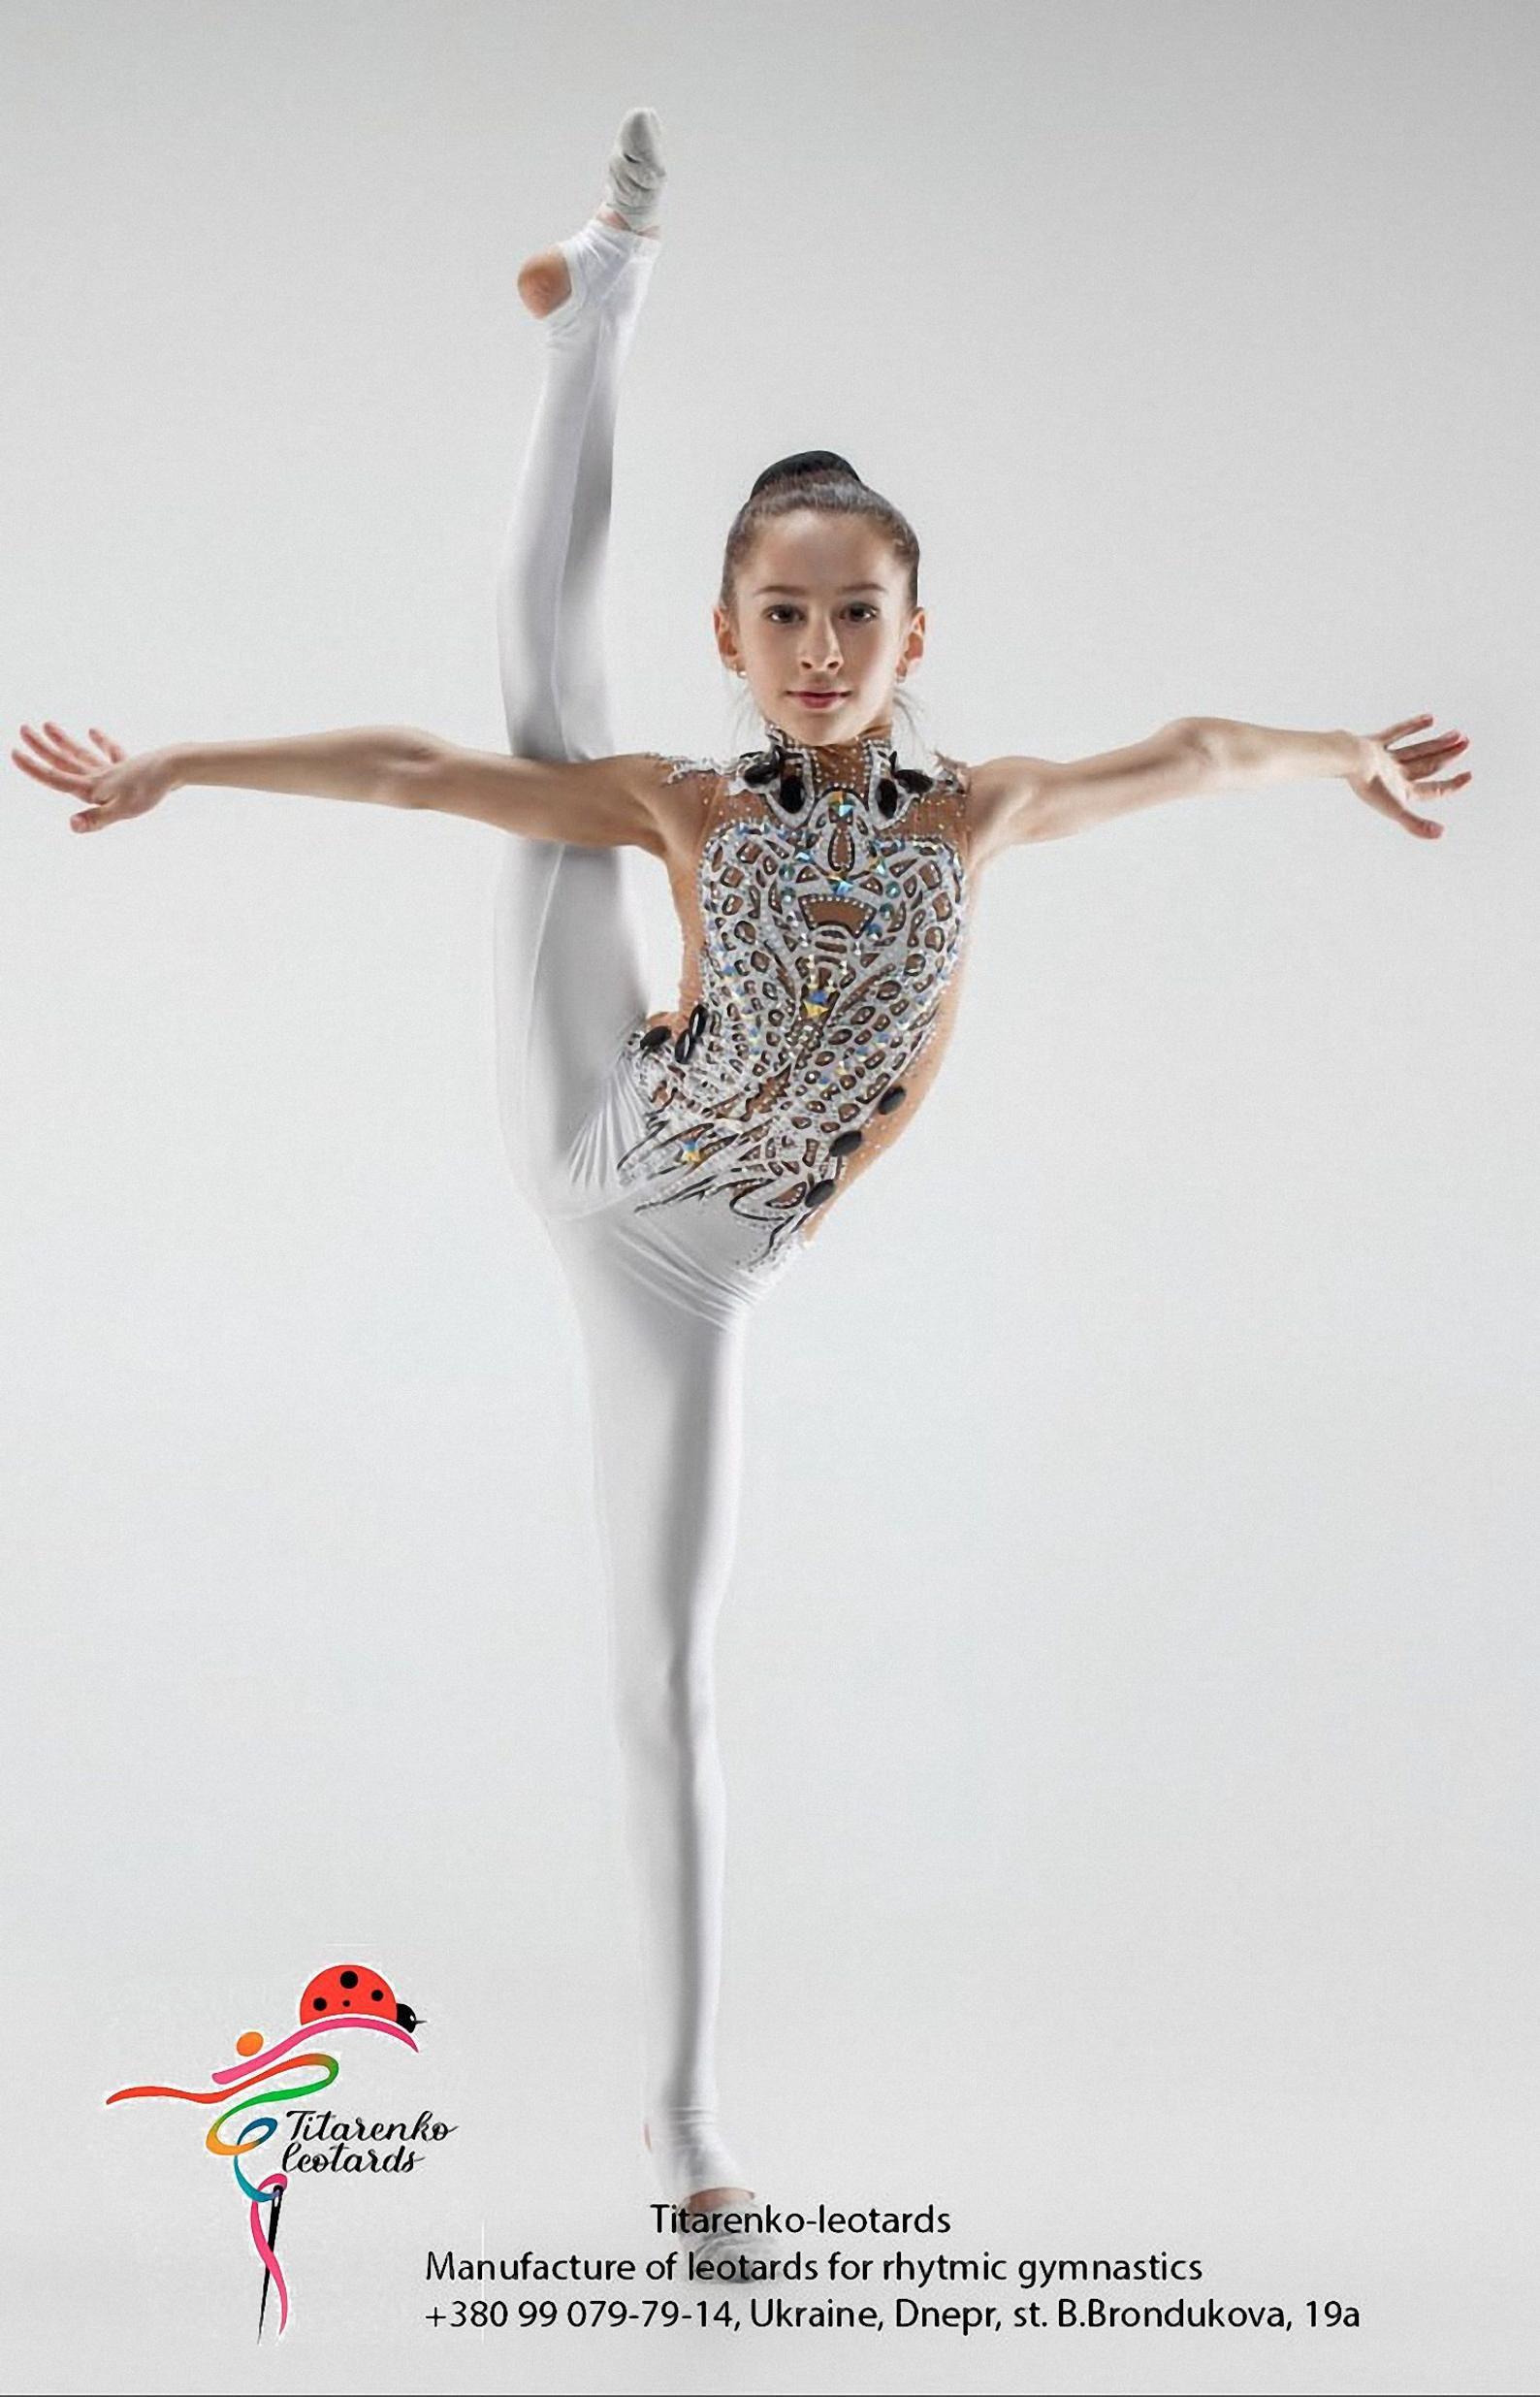 acrobatics skating Leotard for rhythmic gymnastics